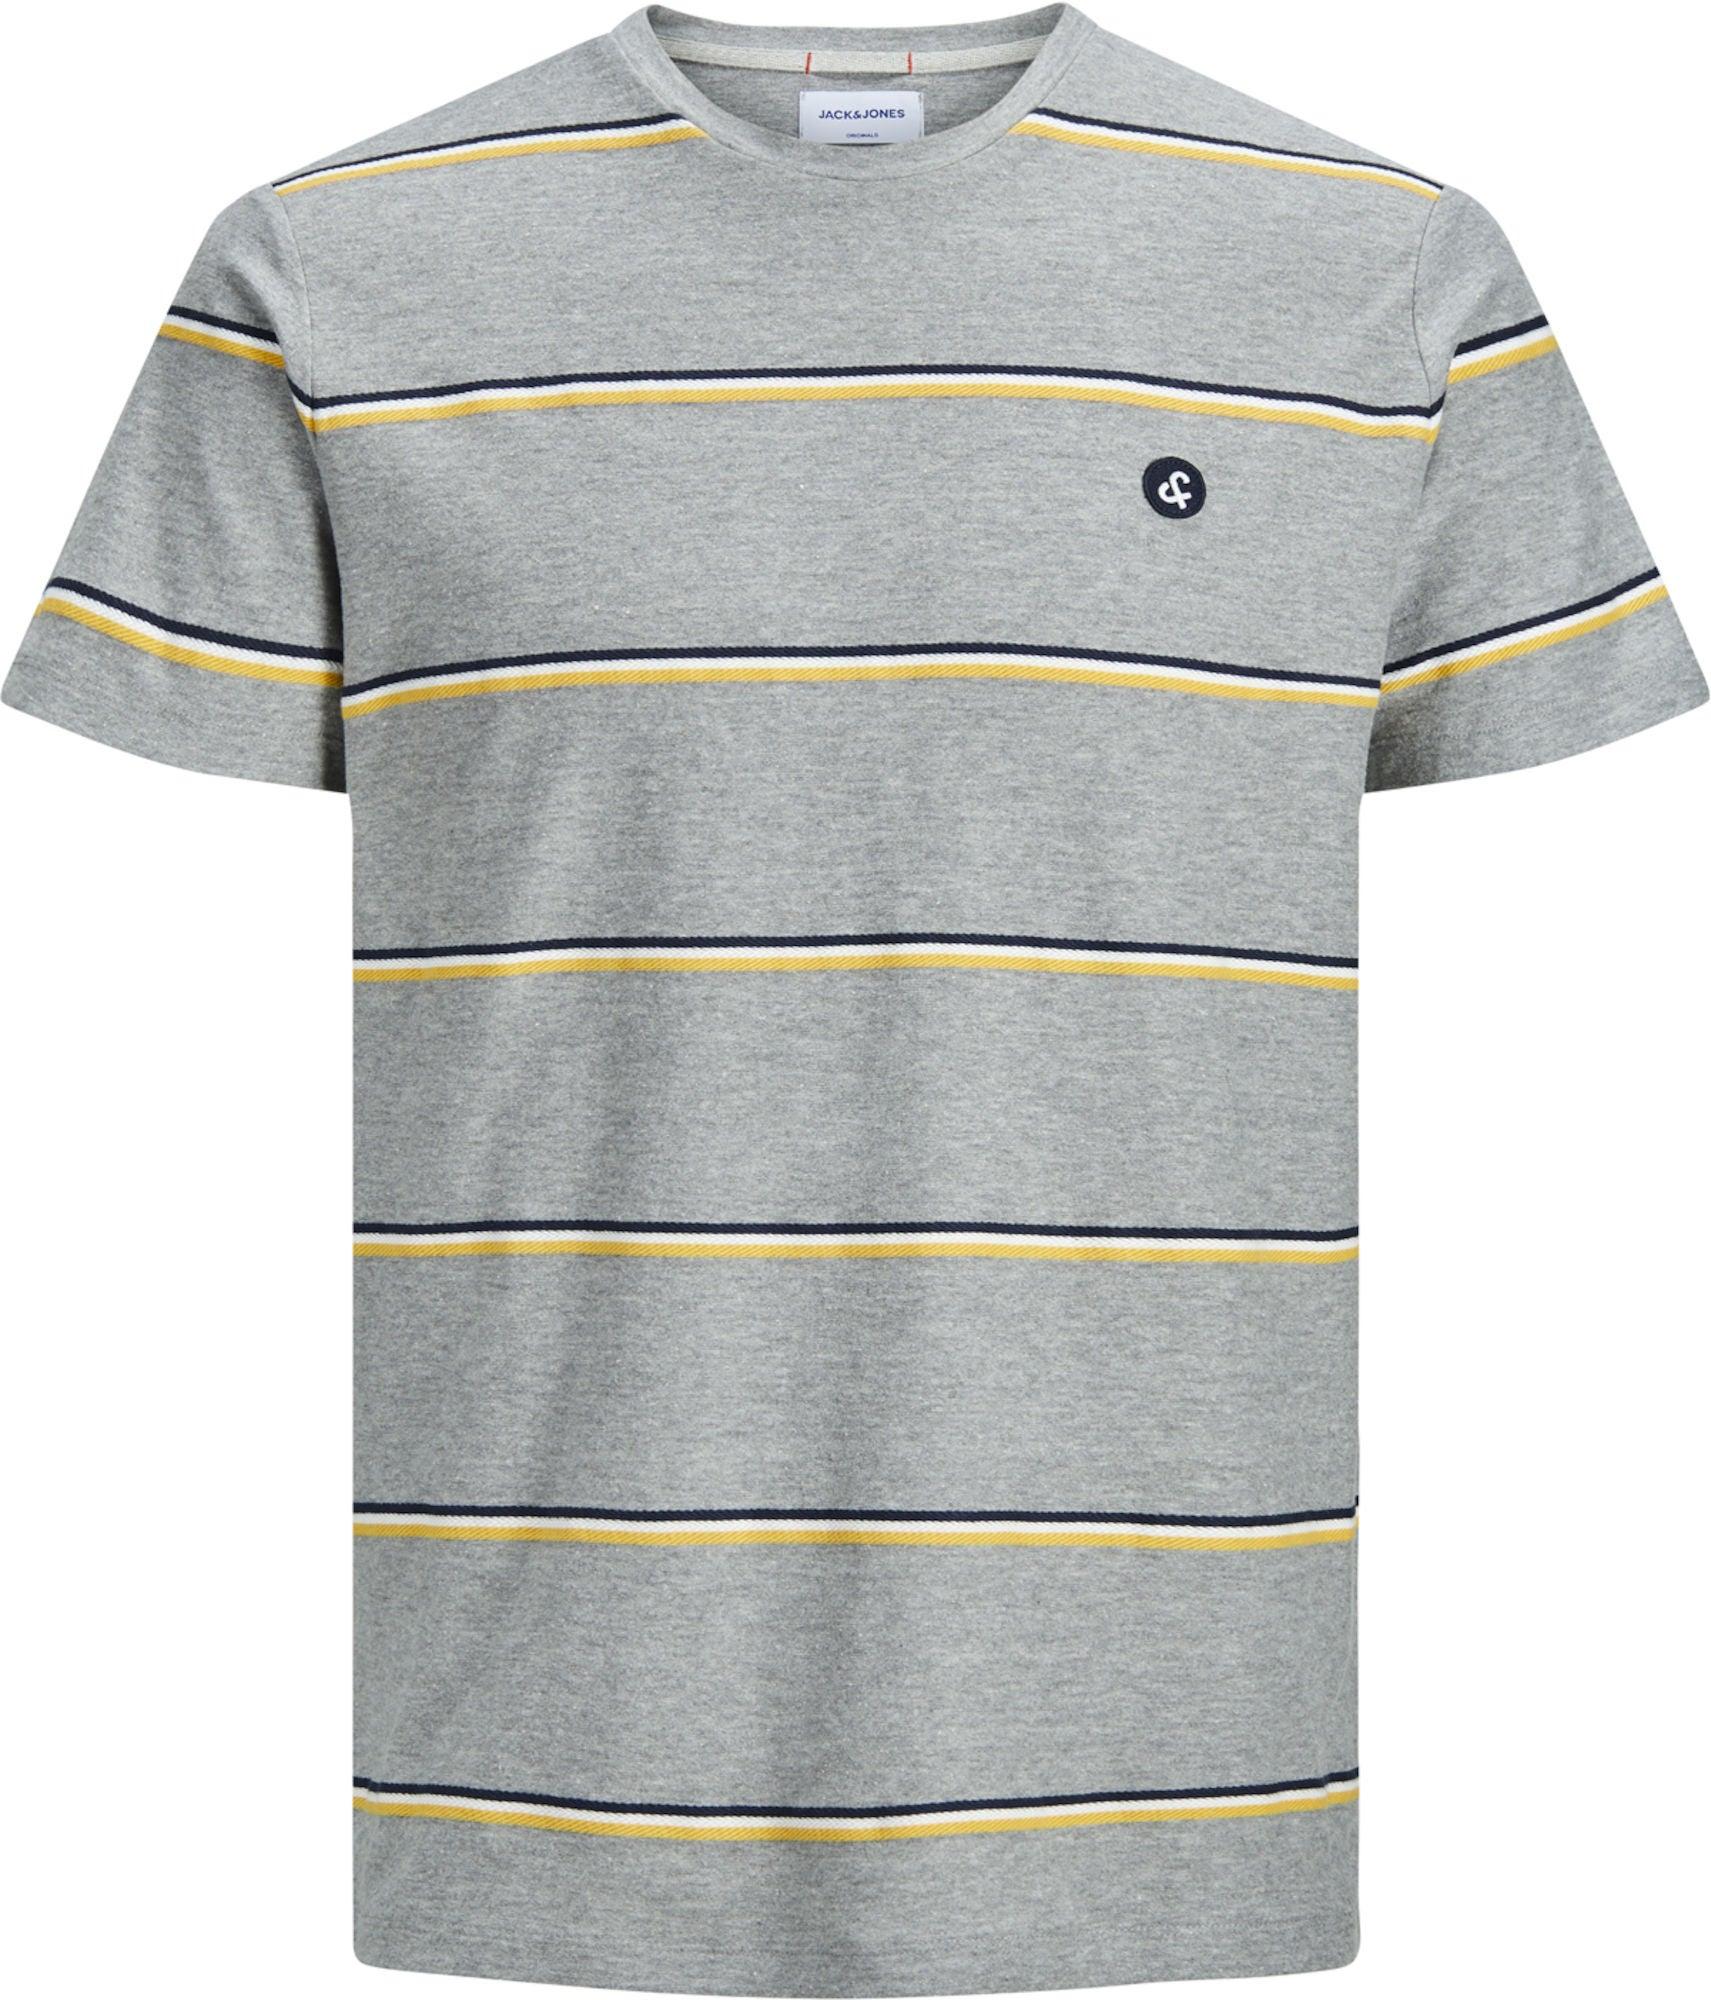 Jack & Jones Herringbone Crewneck T-Shirt, Light Grey Melange 152